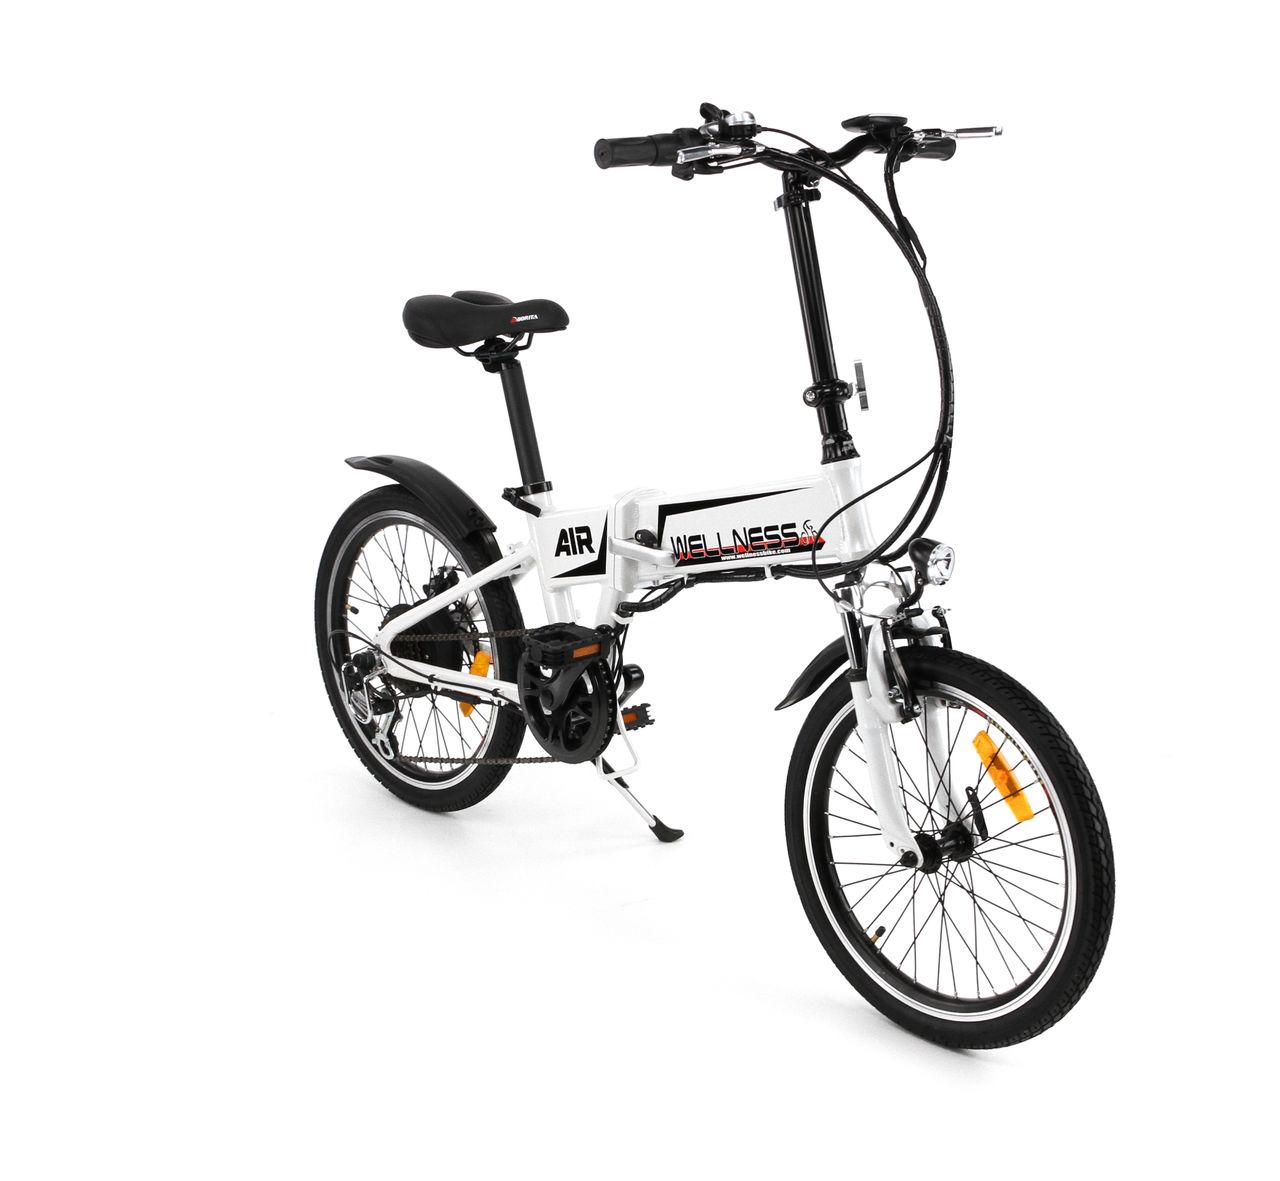 Электровелосипед WELLNESS Air 350-2